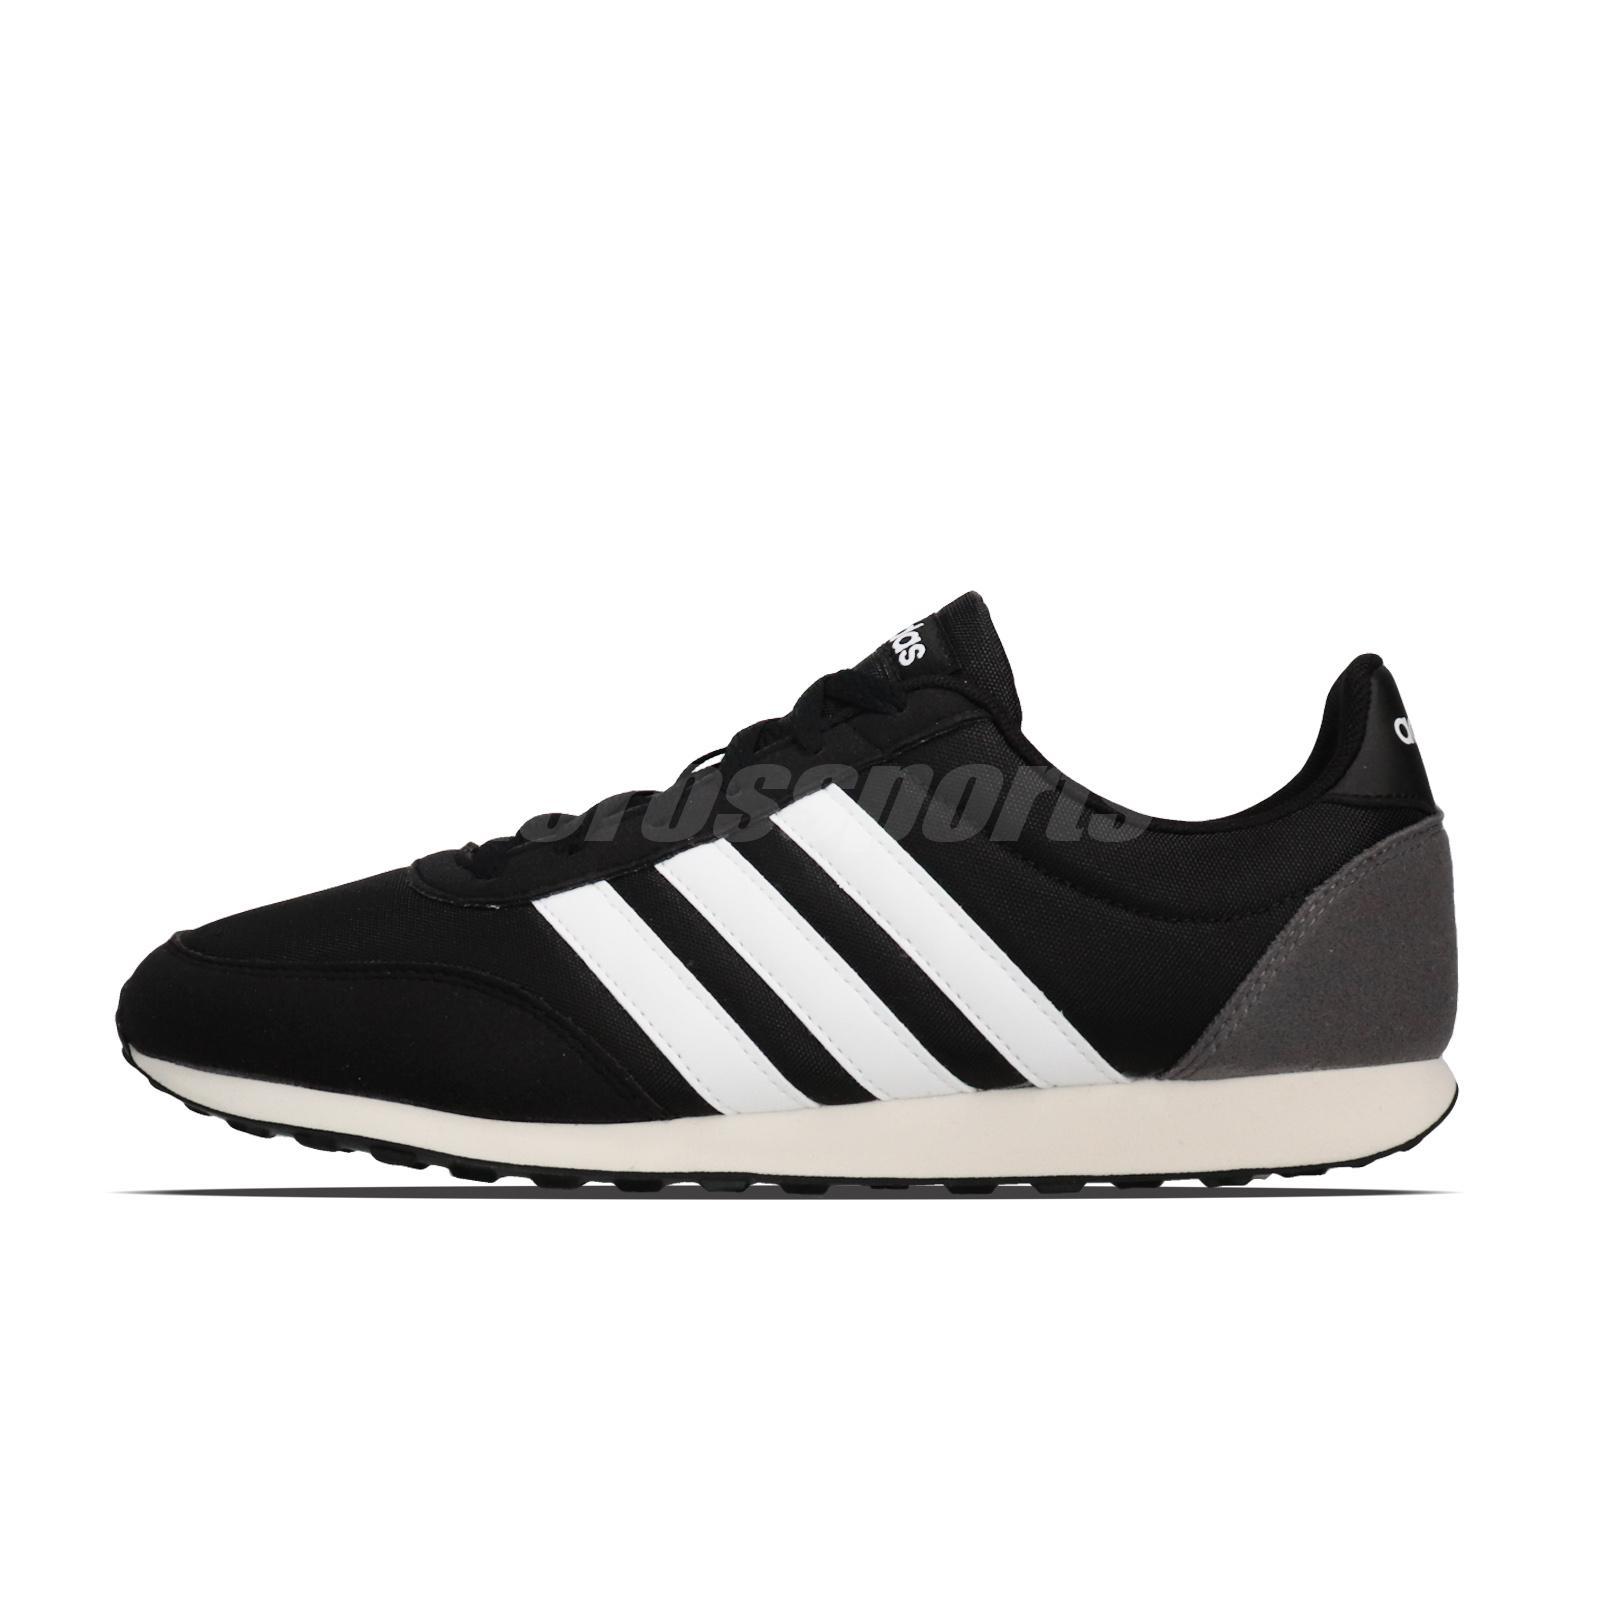 Adidas Mens V Racer 2.0 Neo Sport Style Walking Shoes Core Black White BC0106